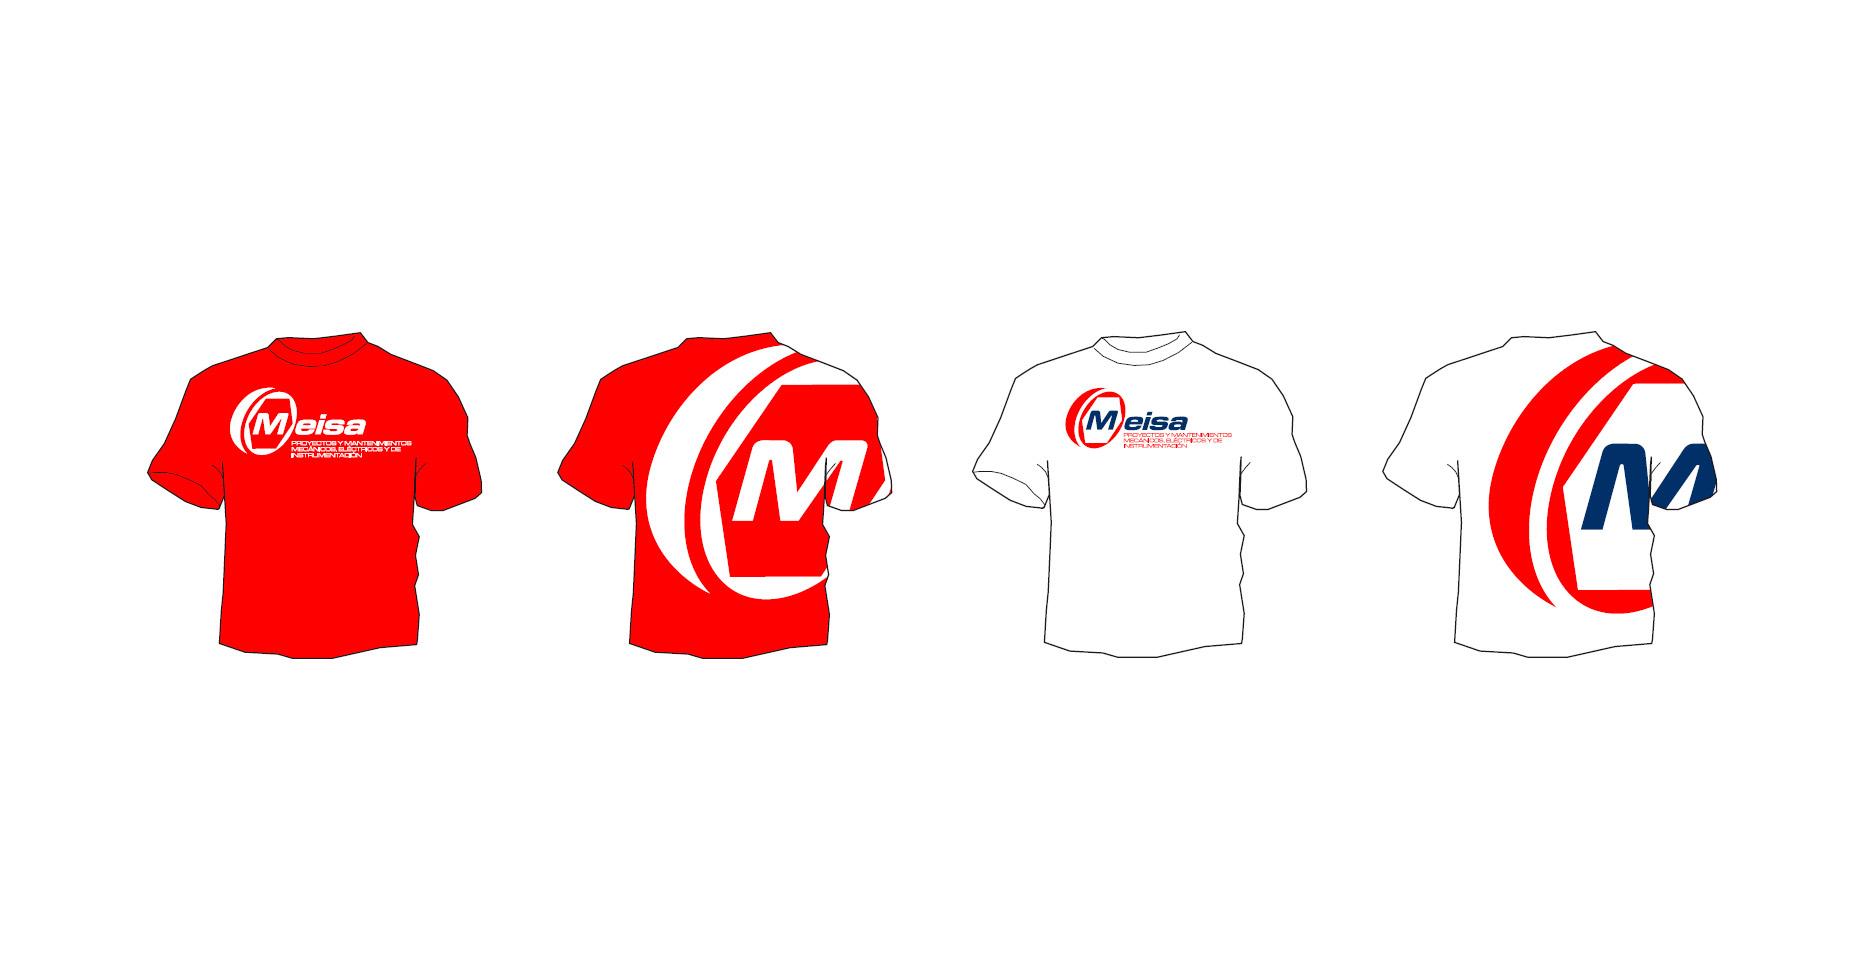 Textil meisa diseño gráfico corporativo